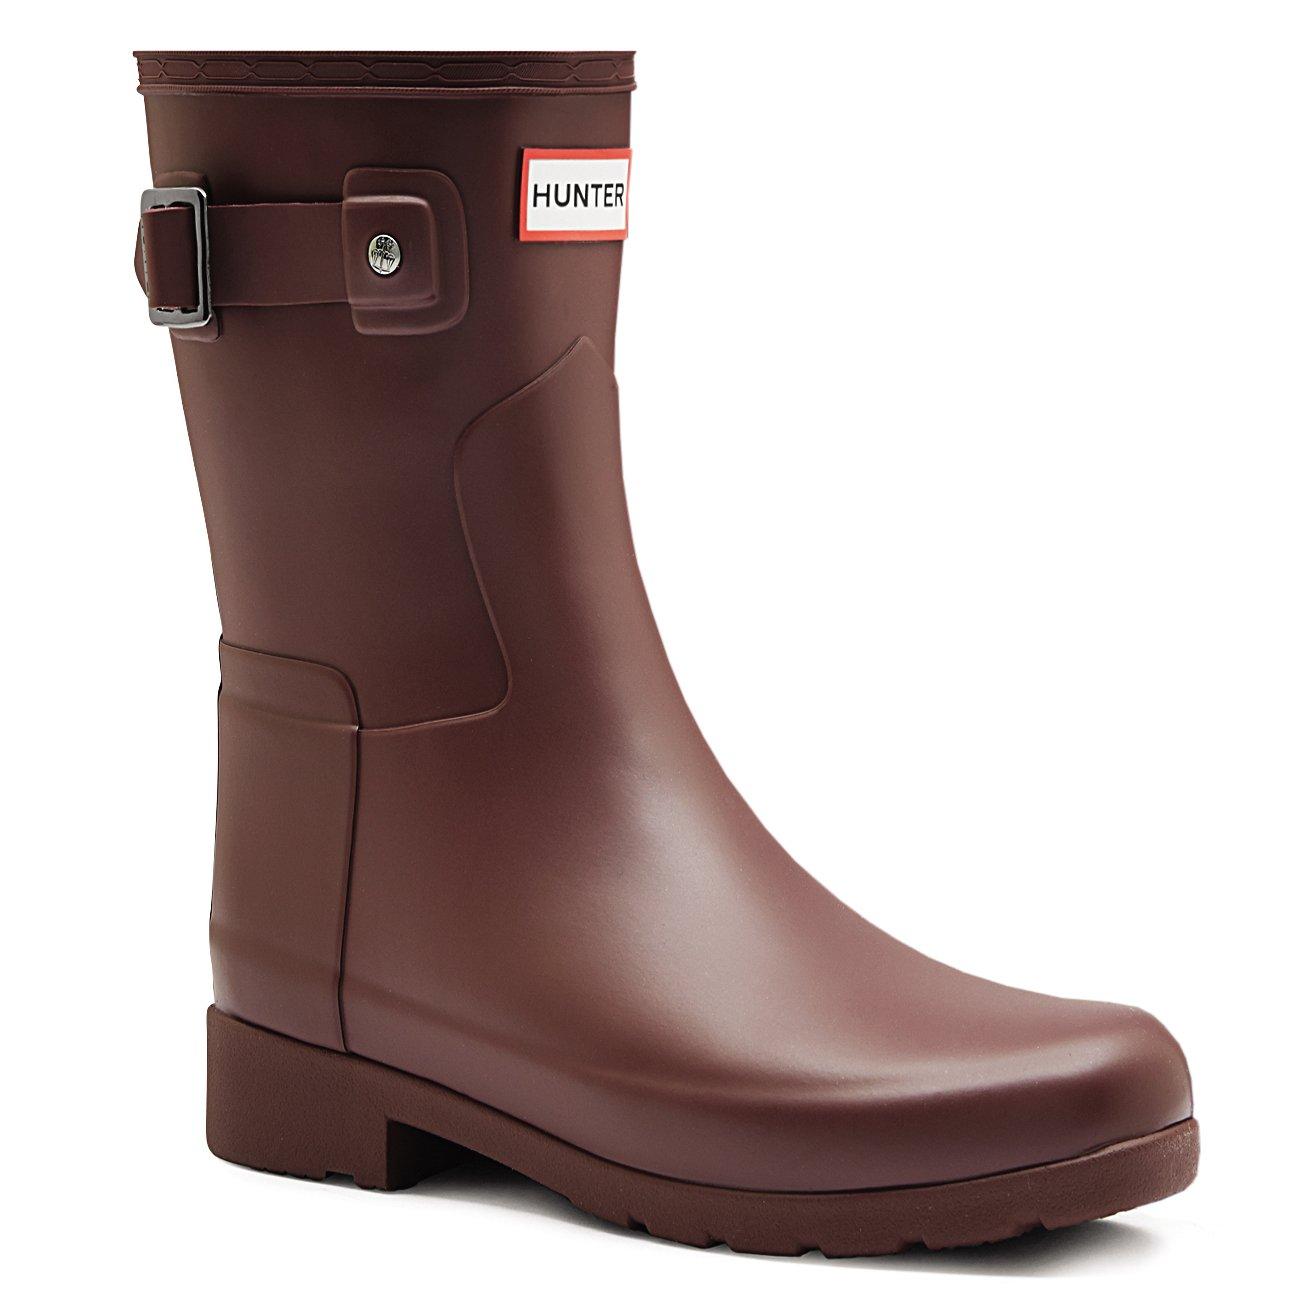 Hunter Womens Original Refined Short Wellingtons Snow Rain Winter Boots - dulse - 7